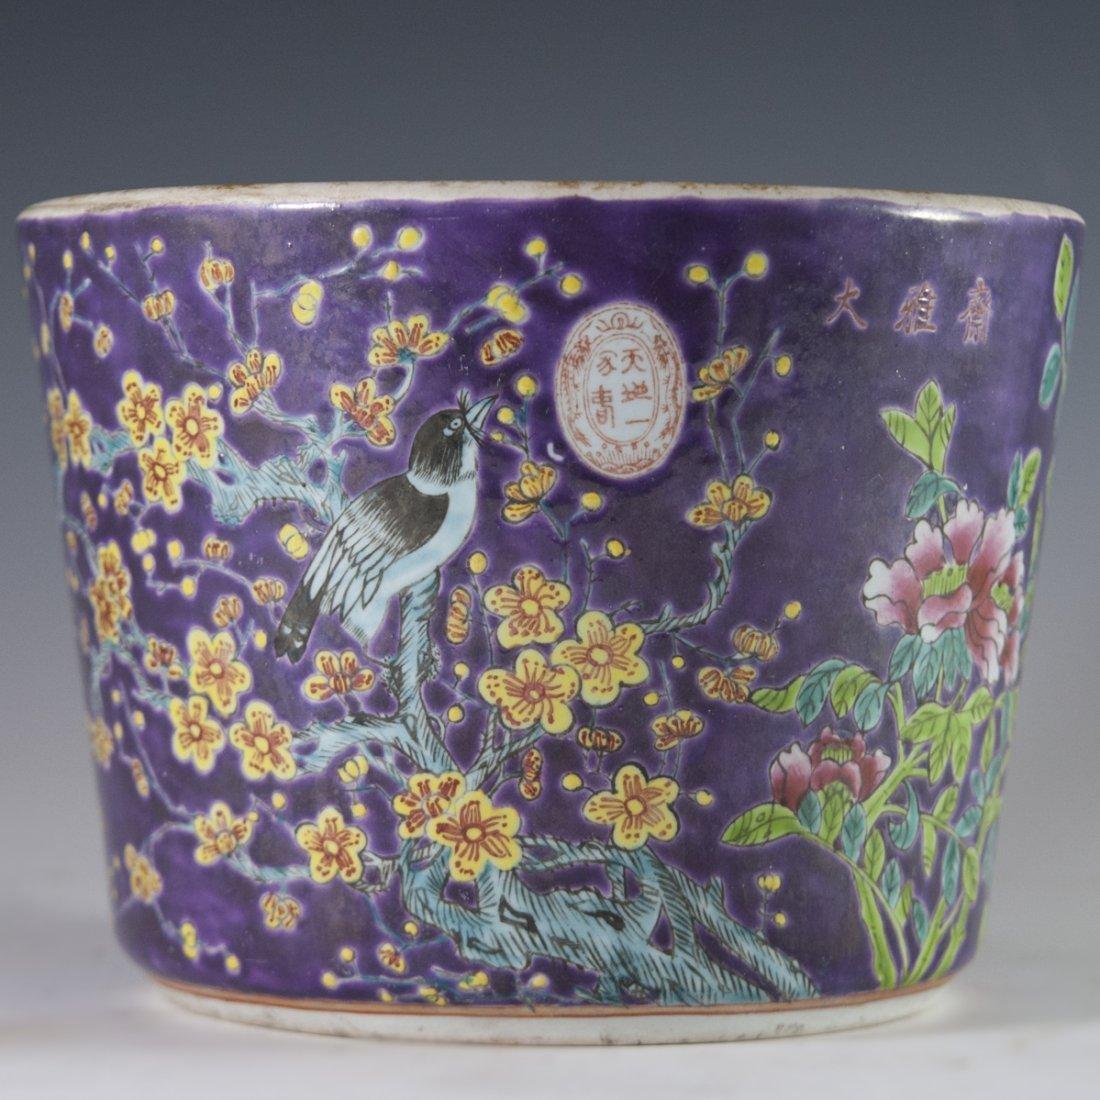 Chinese Porcelain Daya Zhai Cache Pot - 5